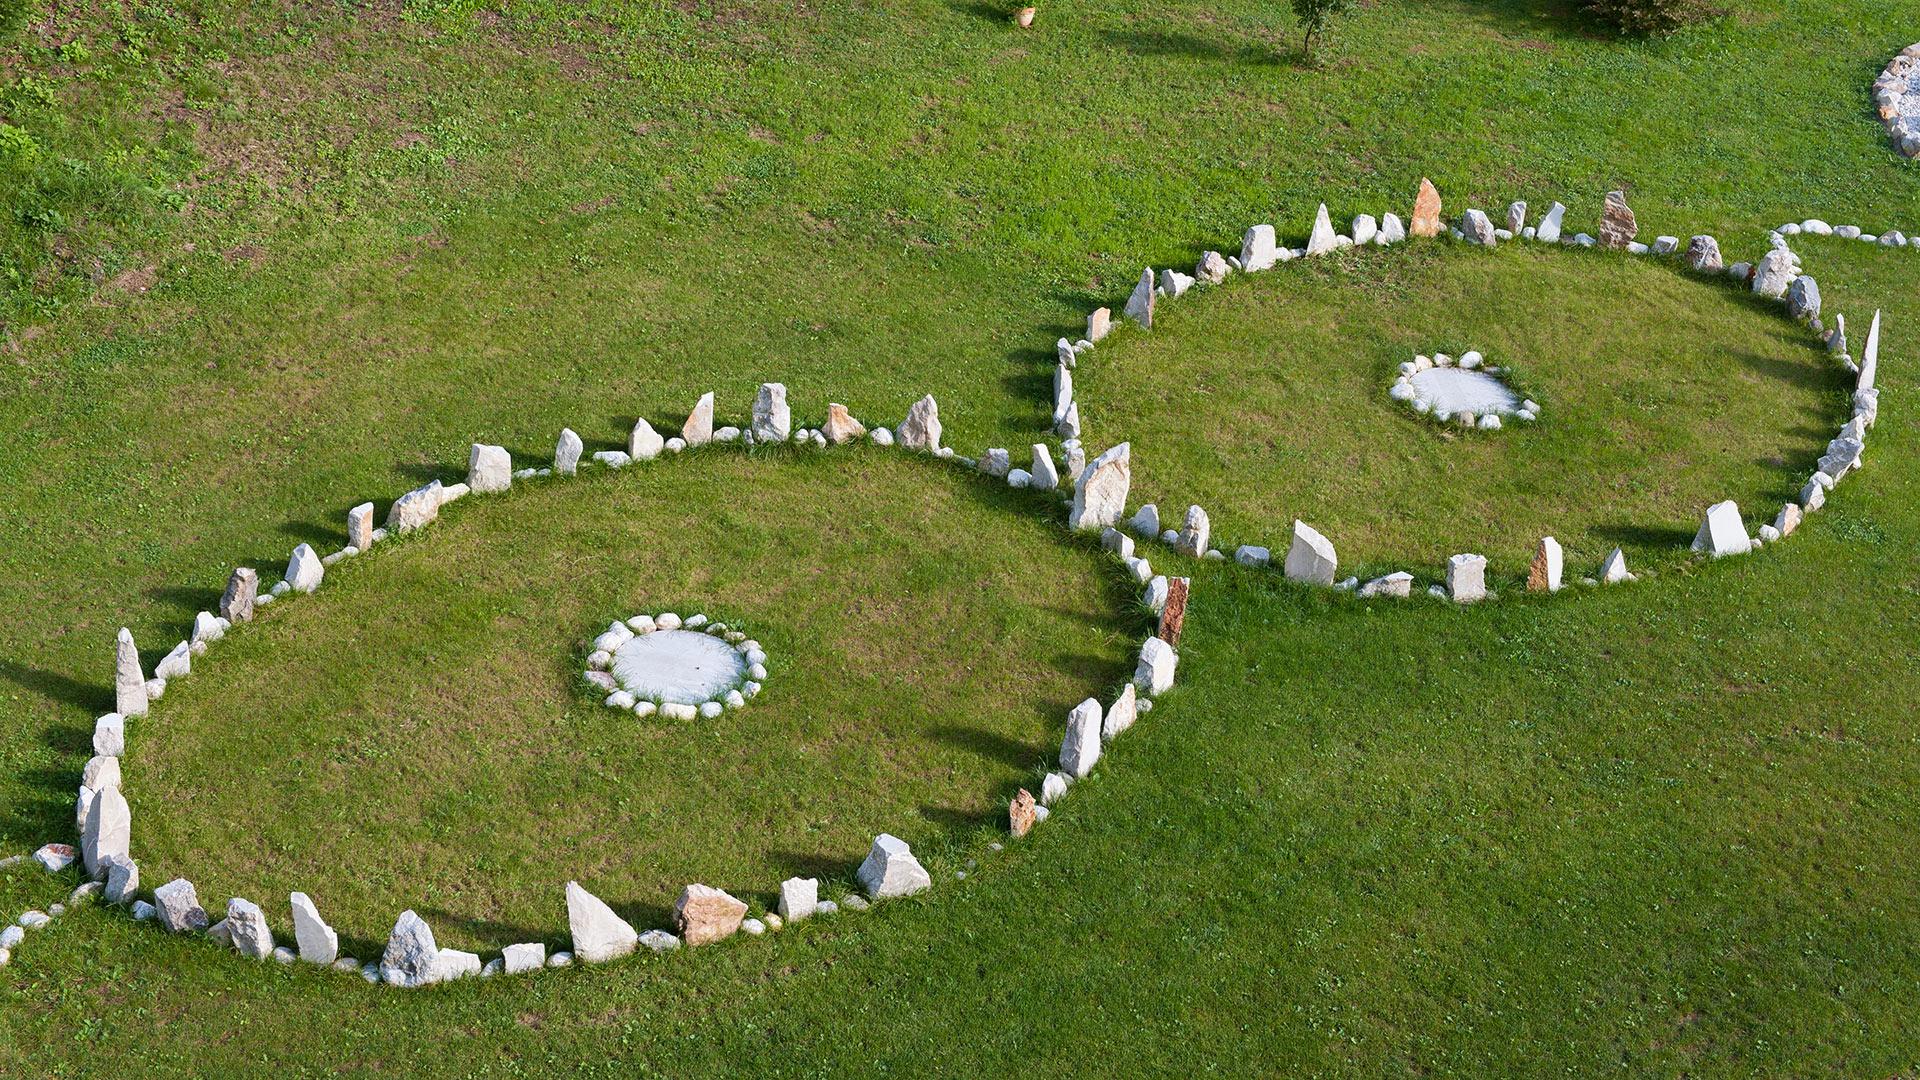 Energijski park, natural healing park, energijske točke, energetske točke